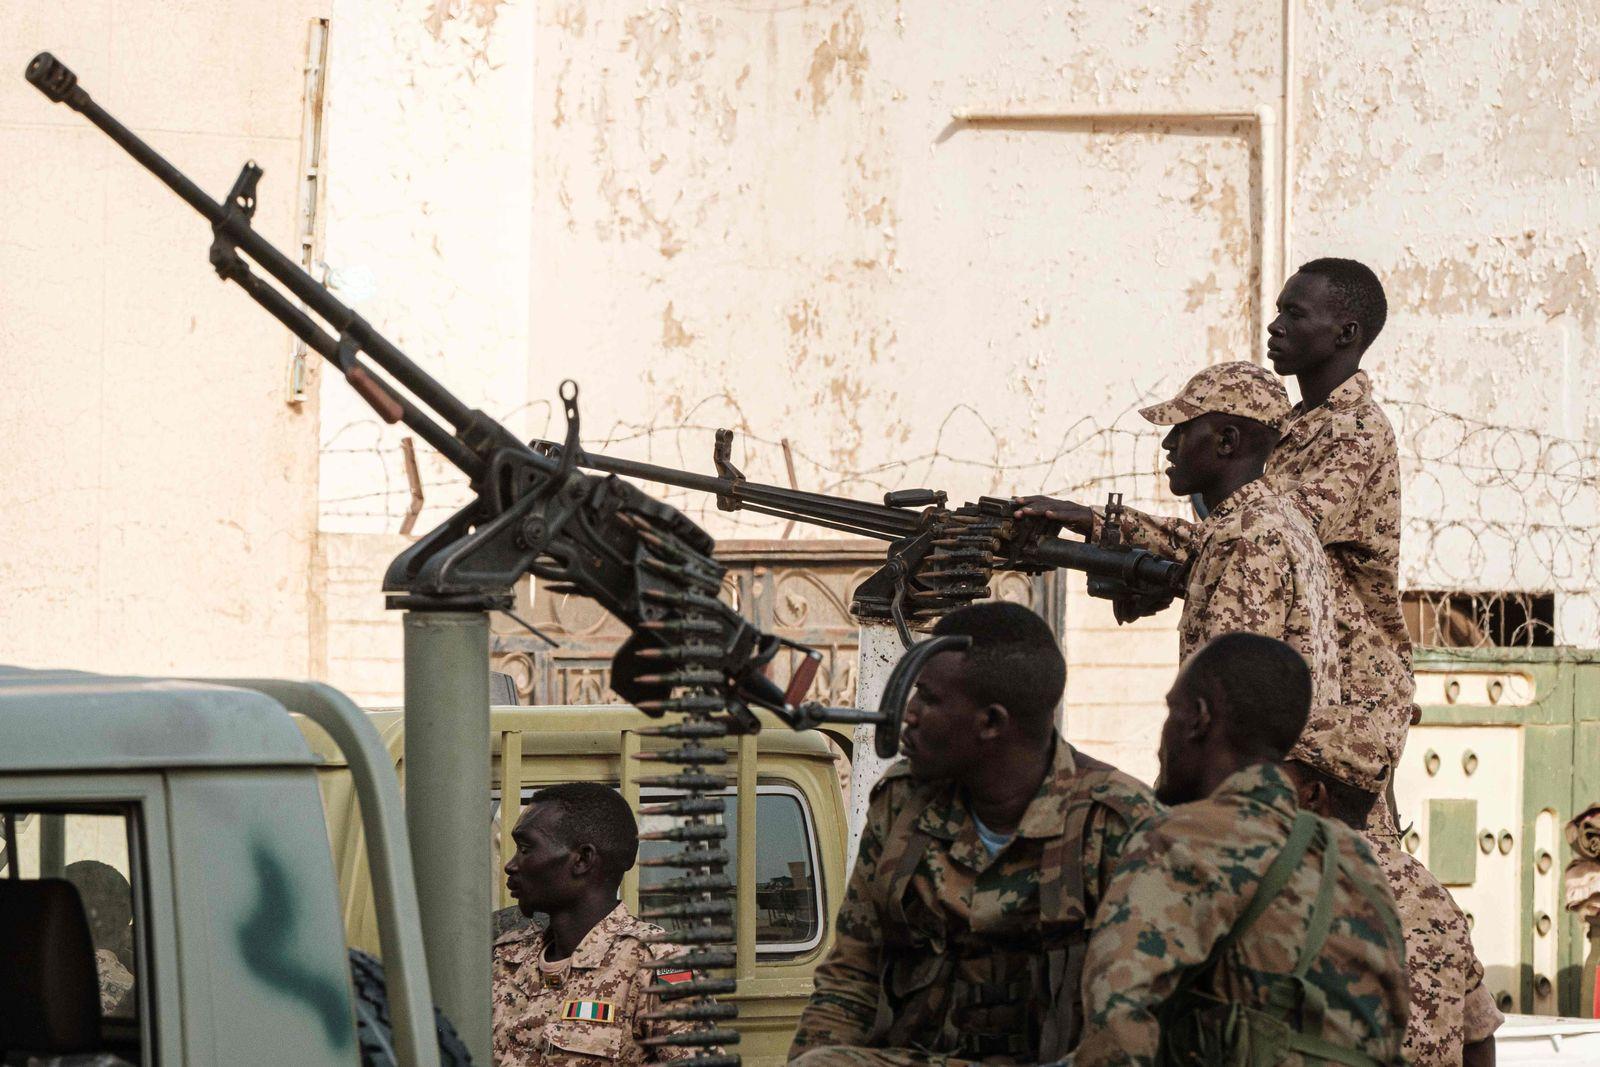 TOPSHOT-SUDAN-POLITICS-UNREST-BASHIR-INVESTIGATION